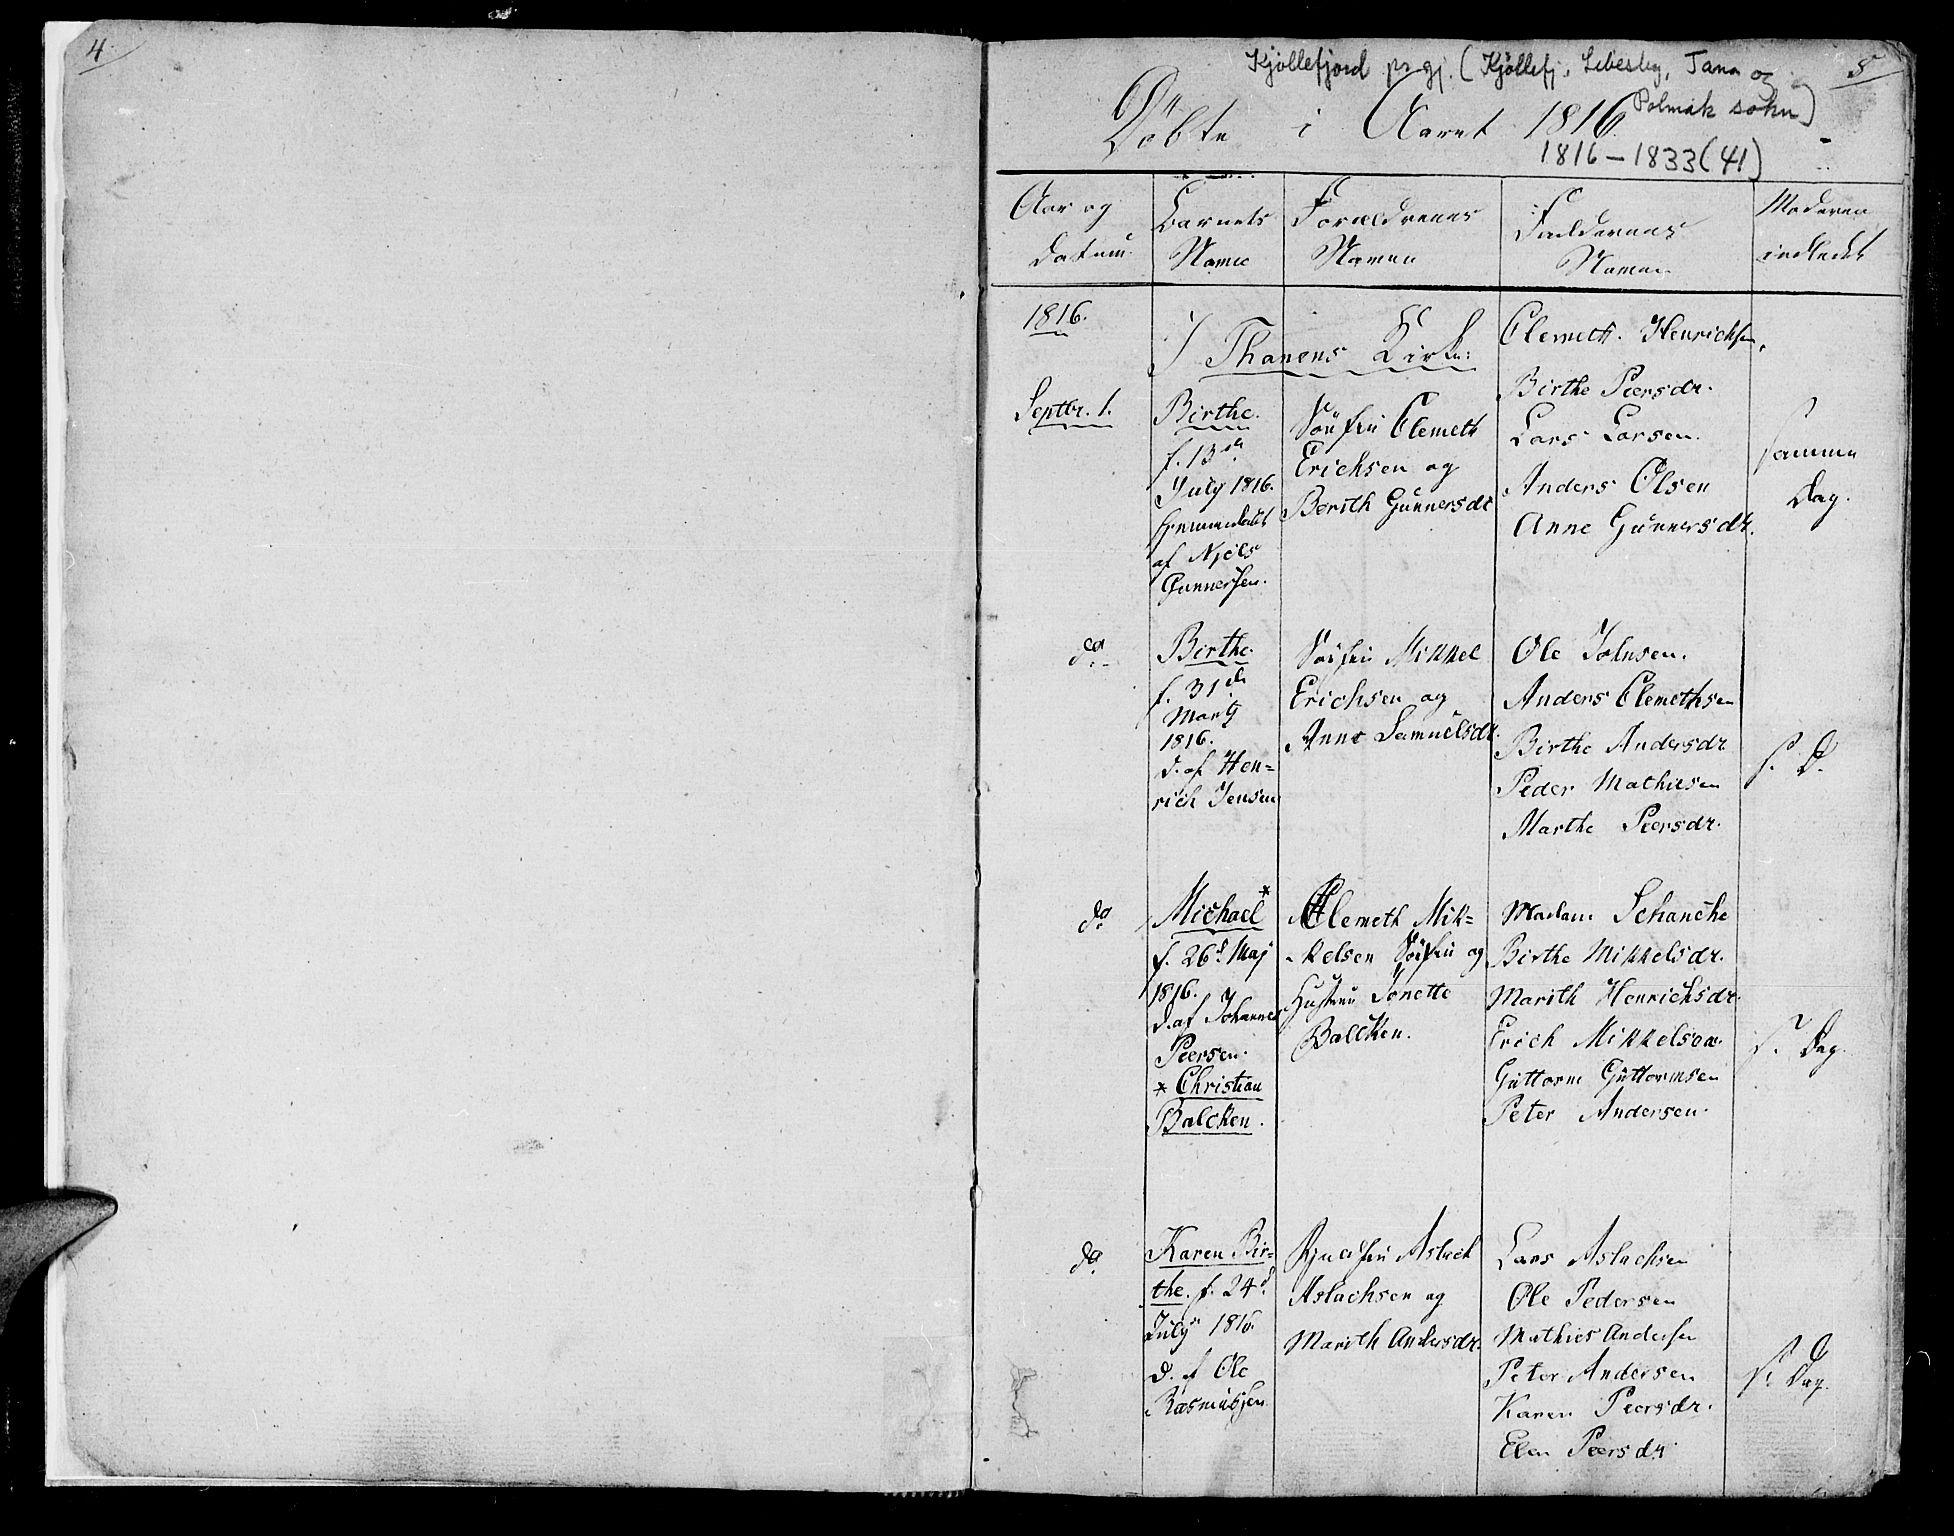 SATØ, Lebesby sokneprestkontor, H/Ha/L0002kirke: Ministerialbok nr. 2, 1816-1833, s. 5